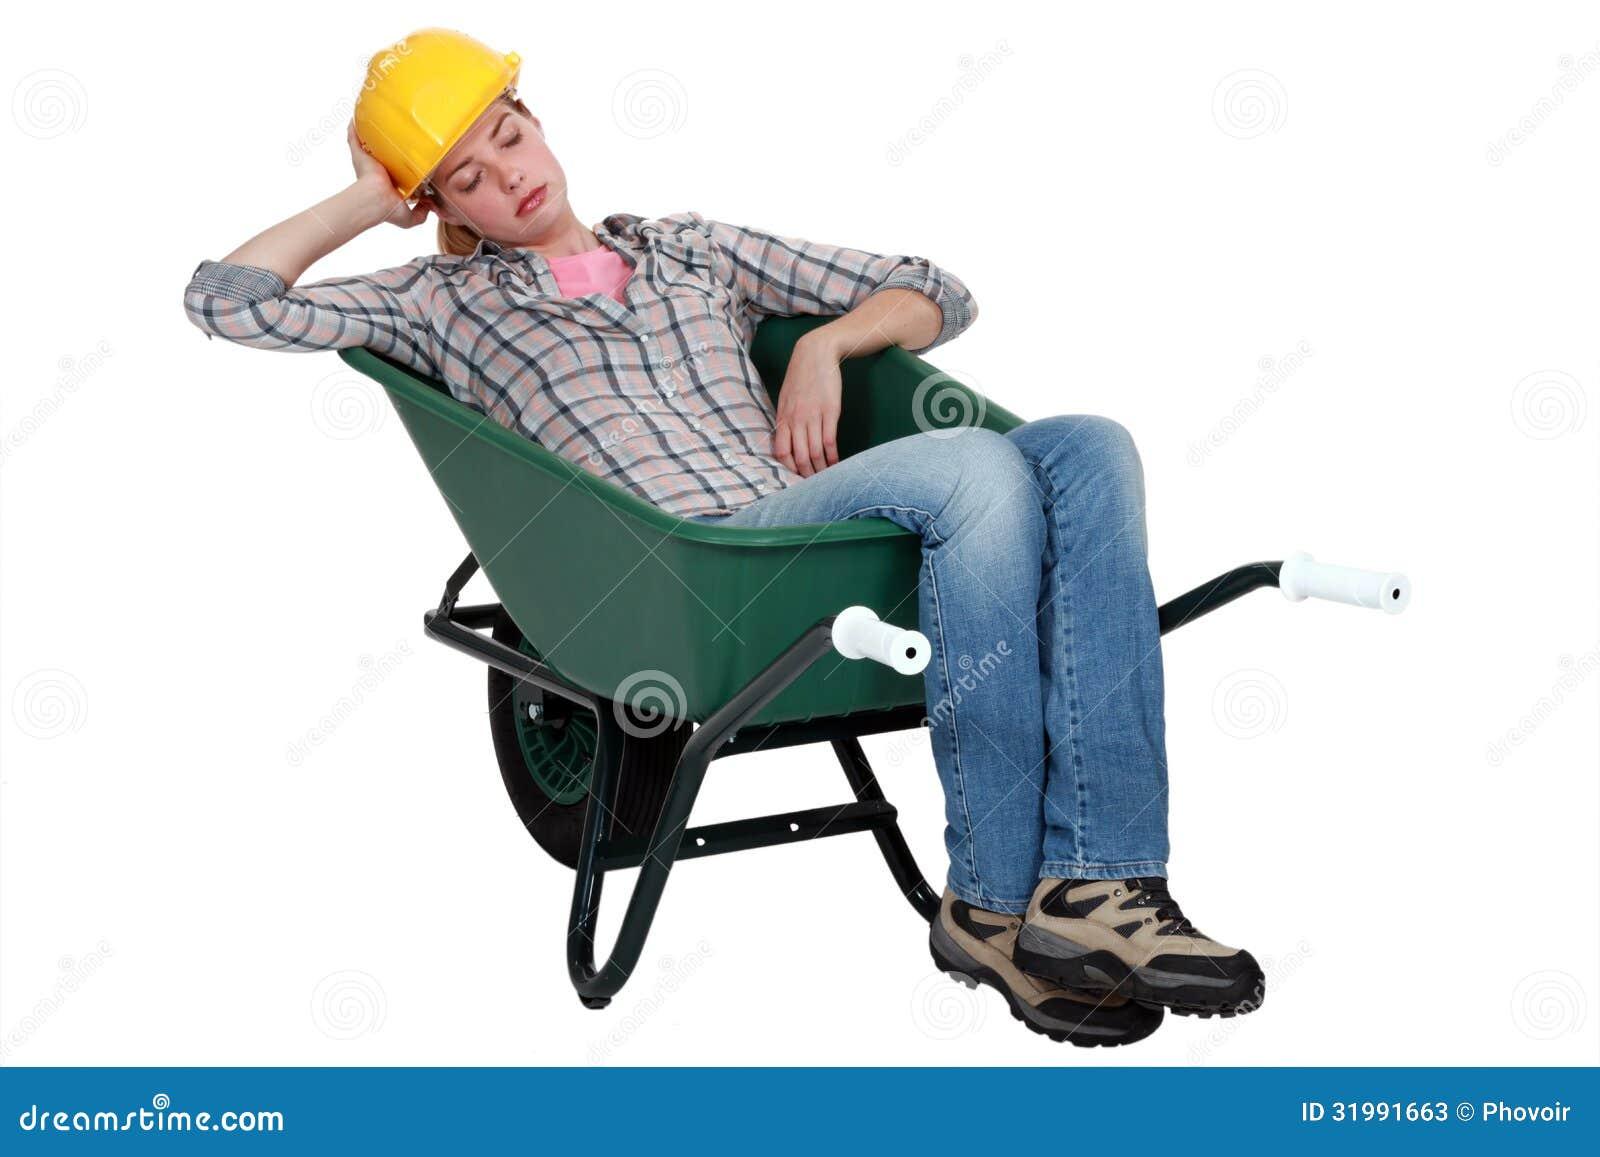 Woman Asleep In Wheelbarrow Stock Image - Image of heap ...